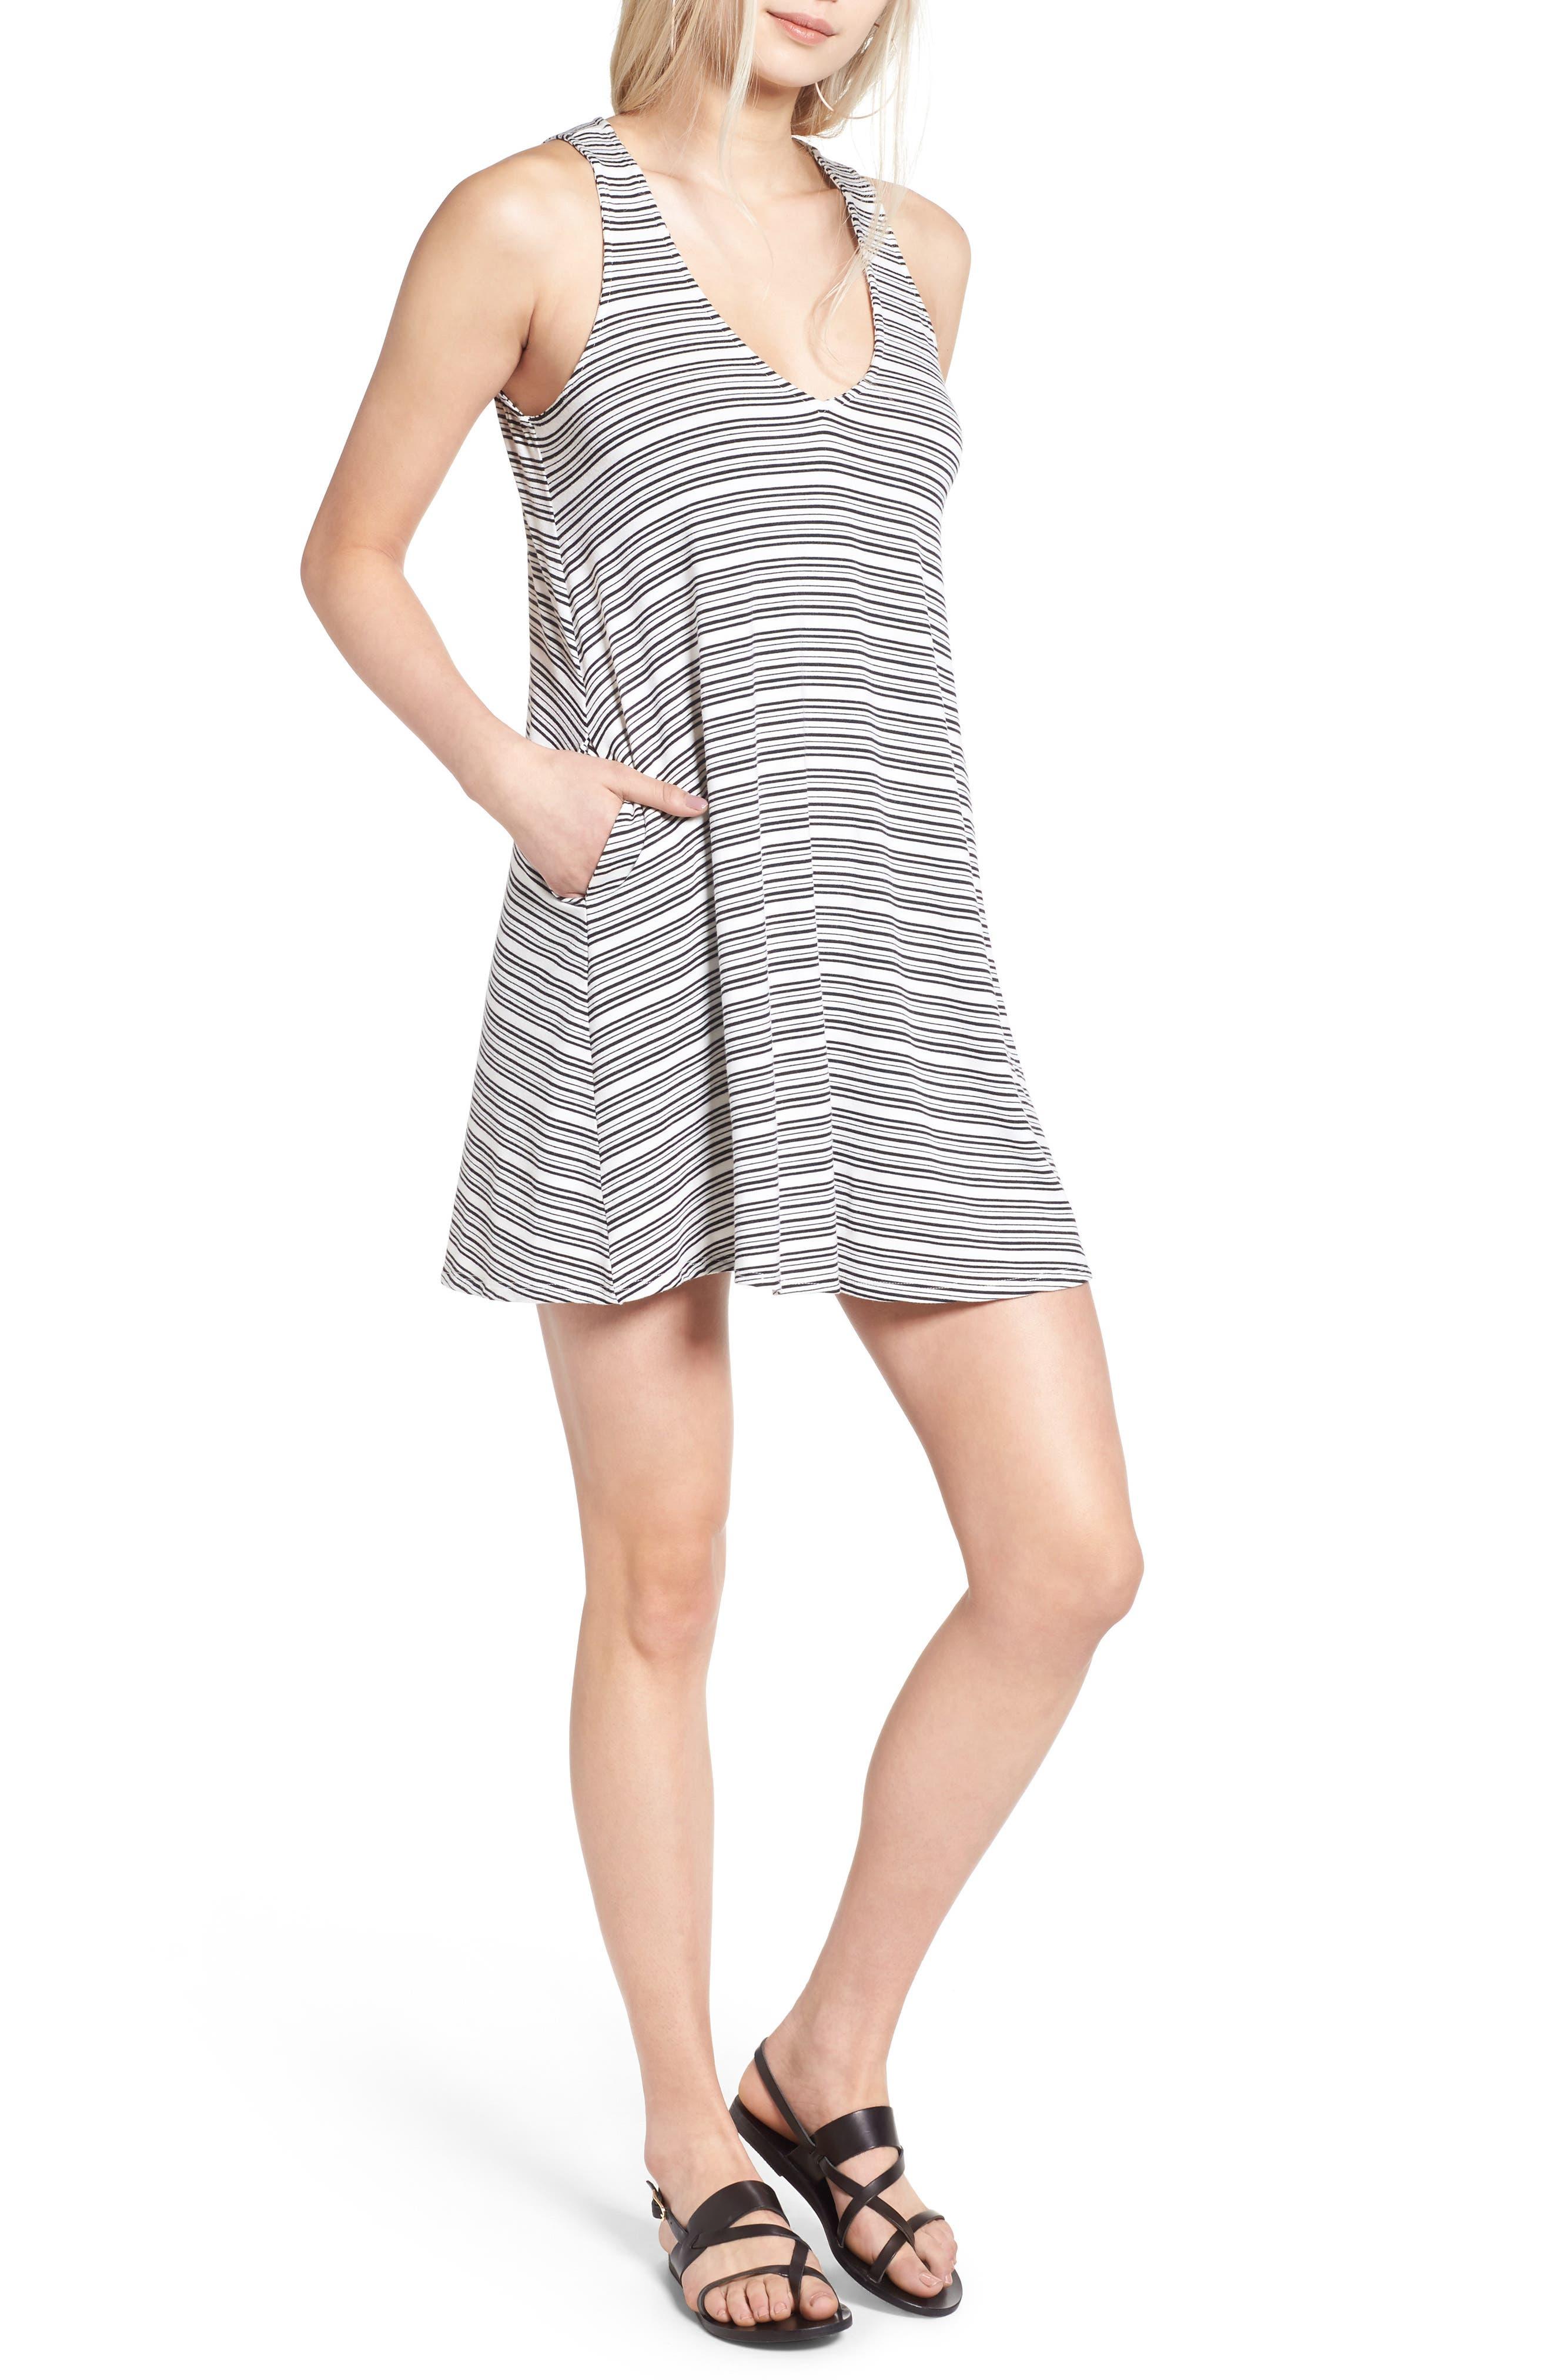 Main Image - Socialite Pocket Tank Dress